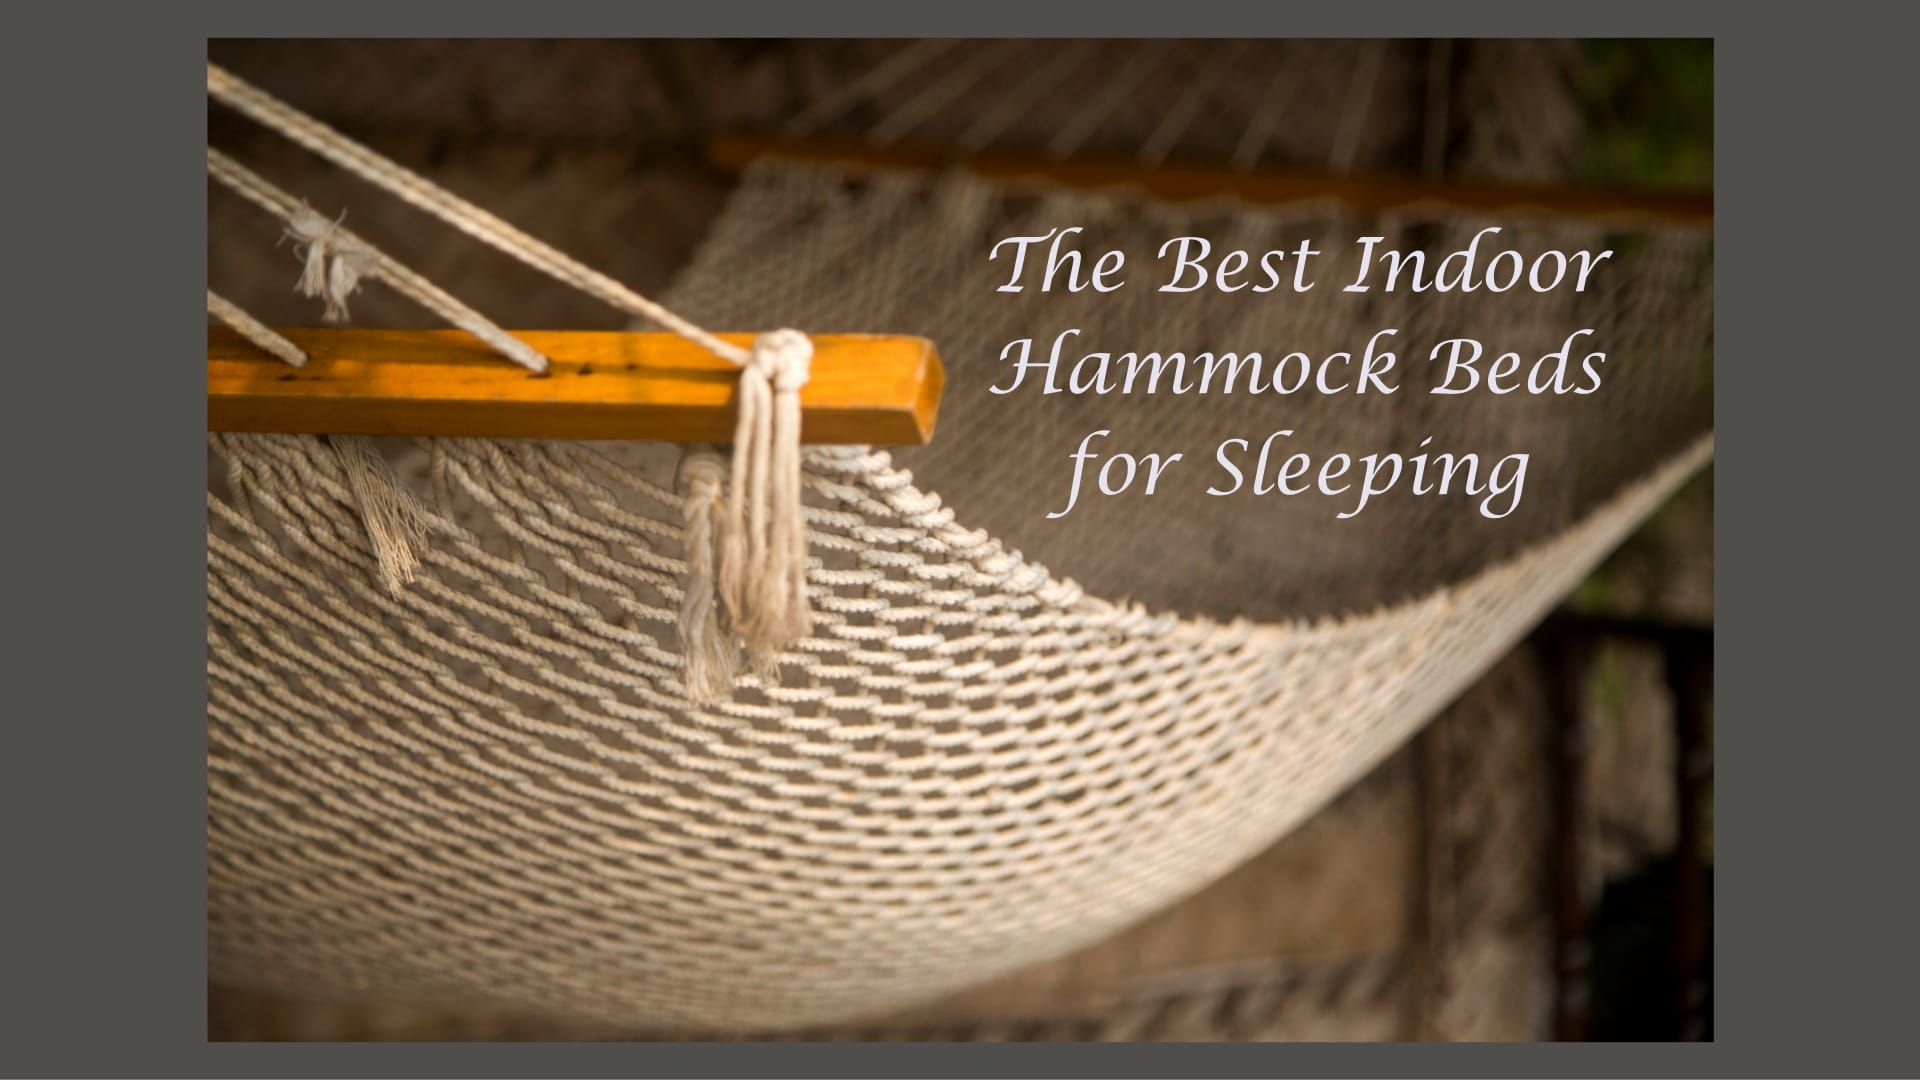 Best Indoor Hammock Beds For Sleeping Hammock Chillout